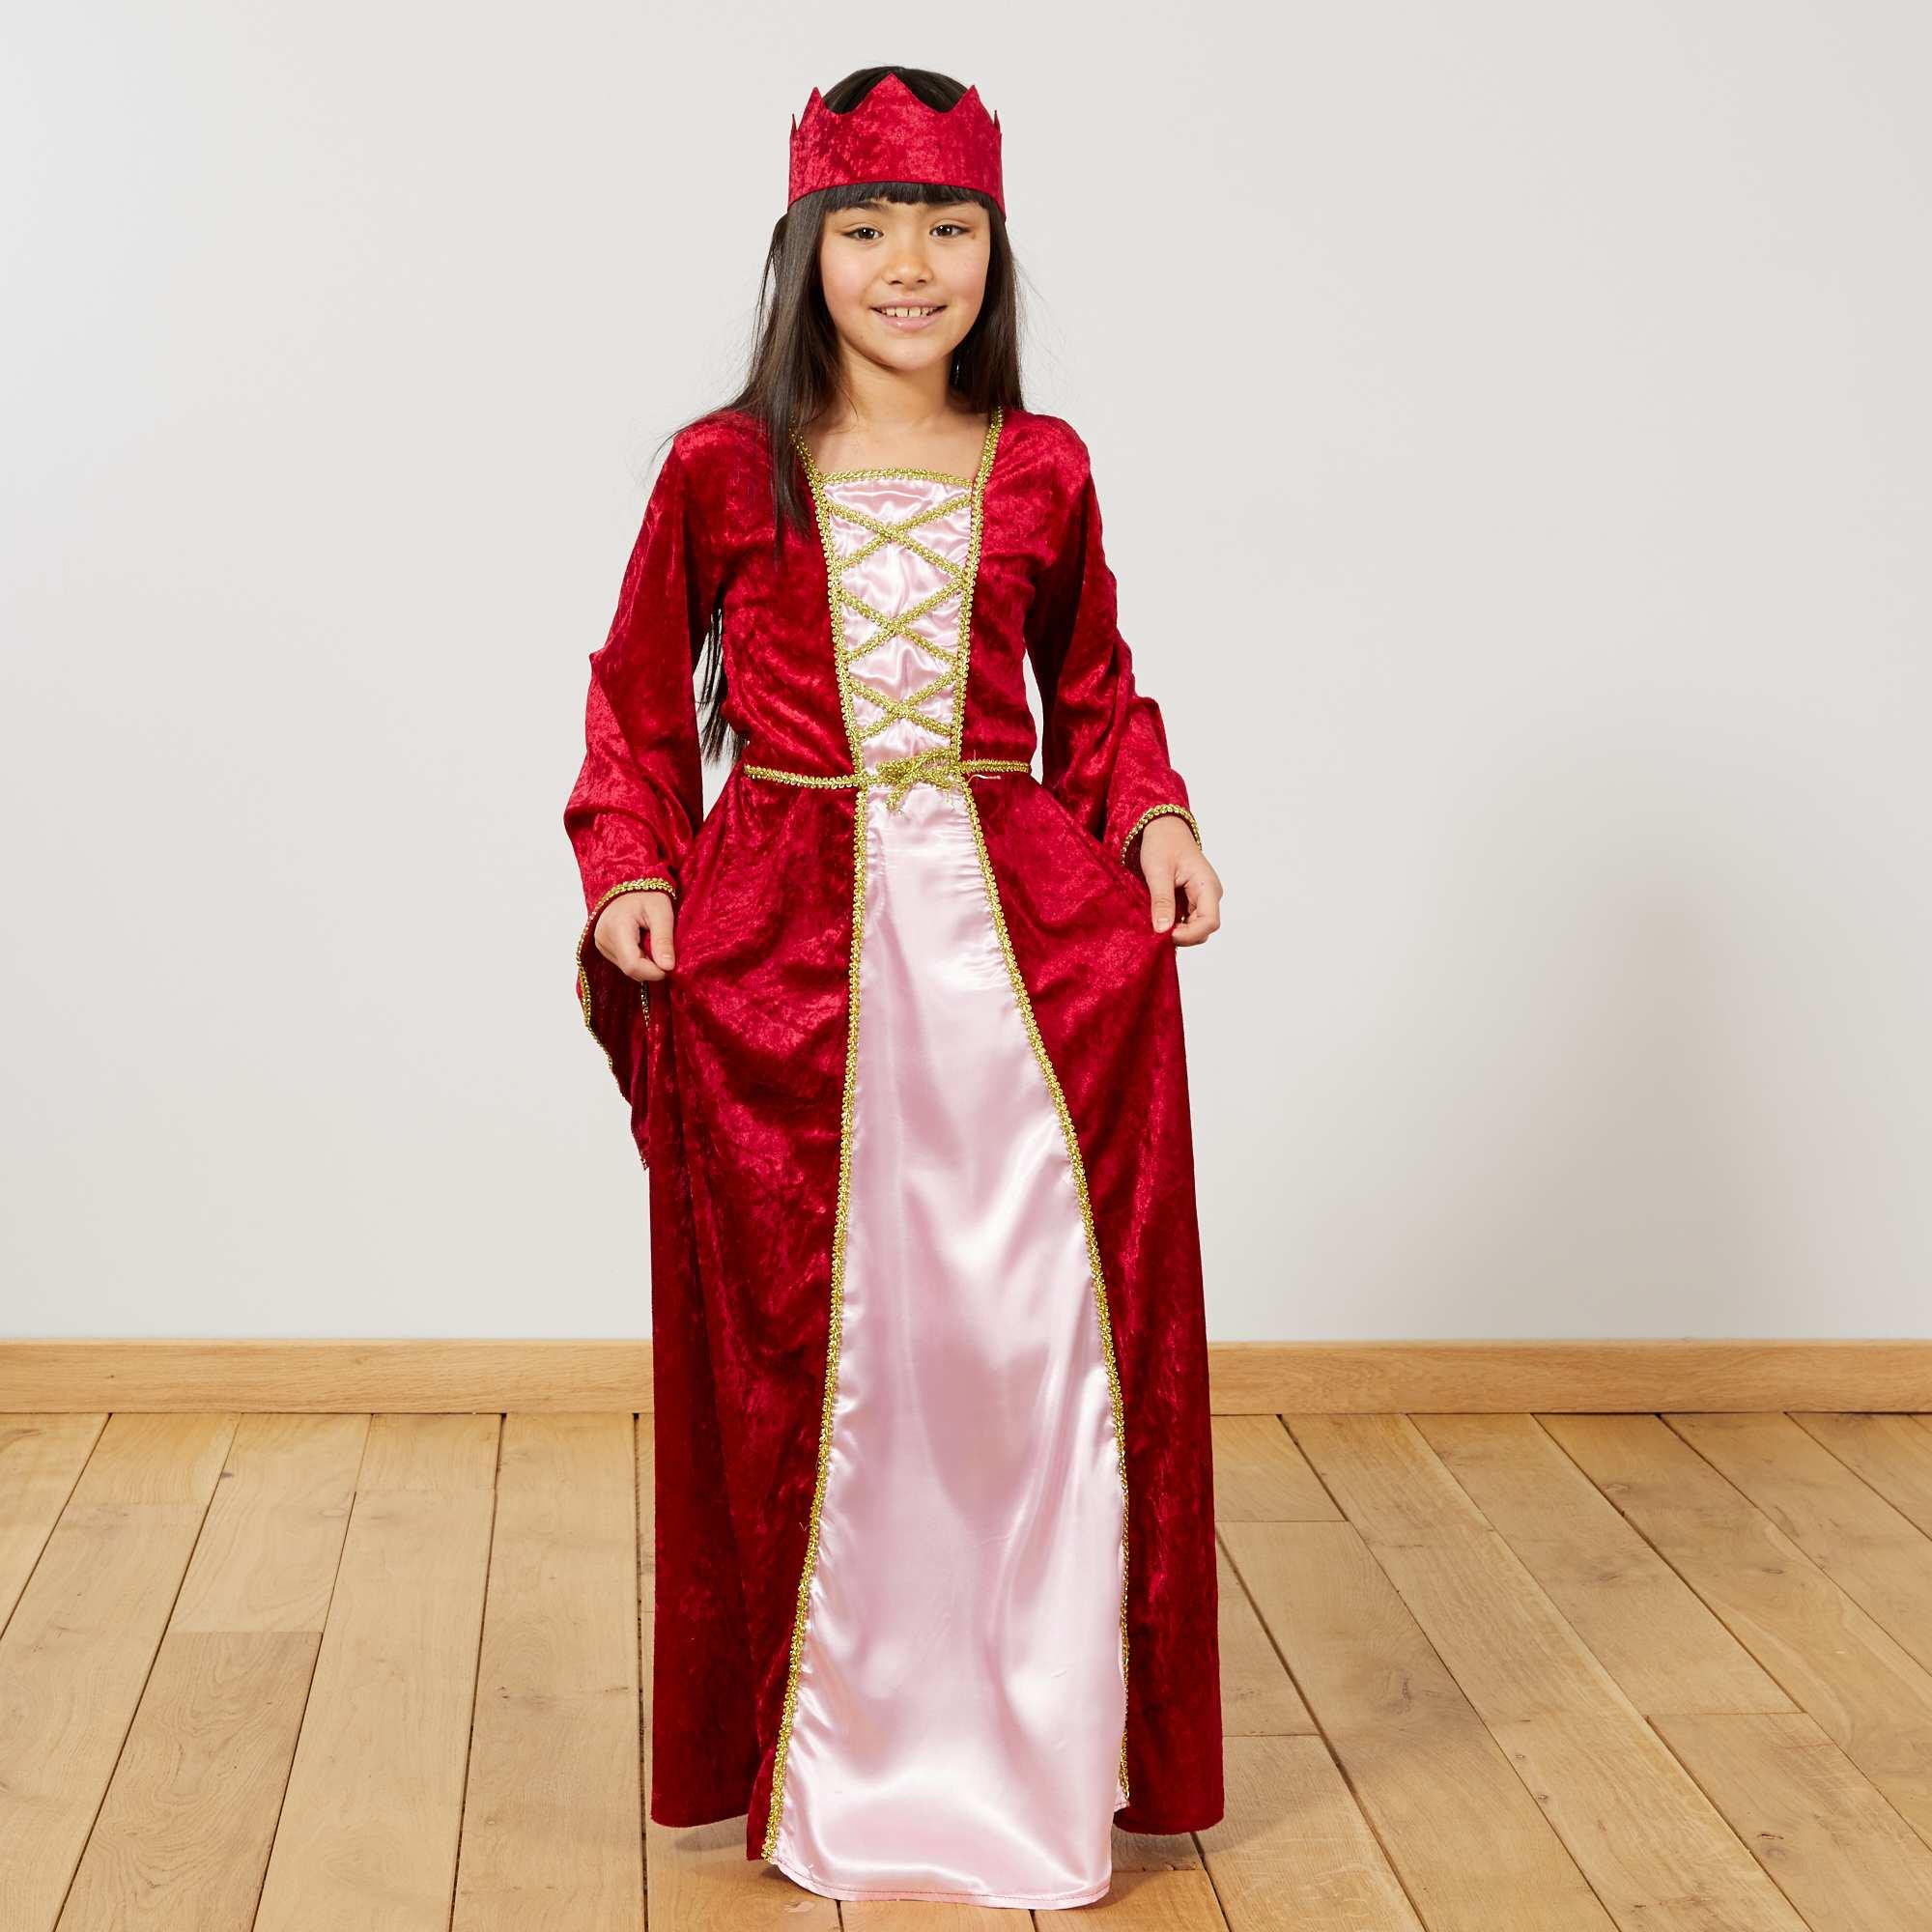 deguisement fille medieval